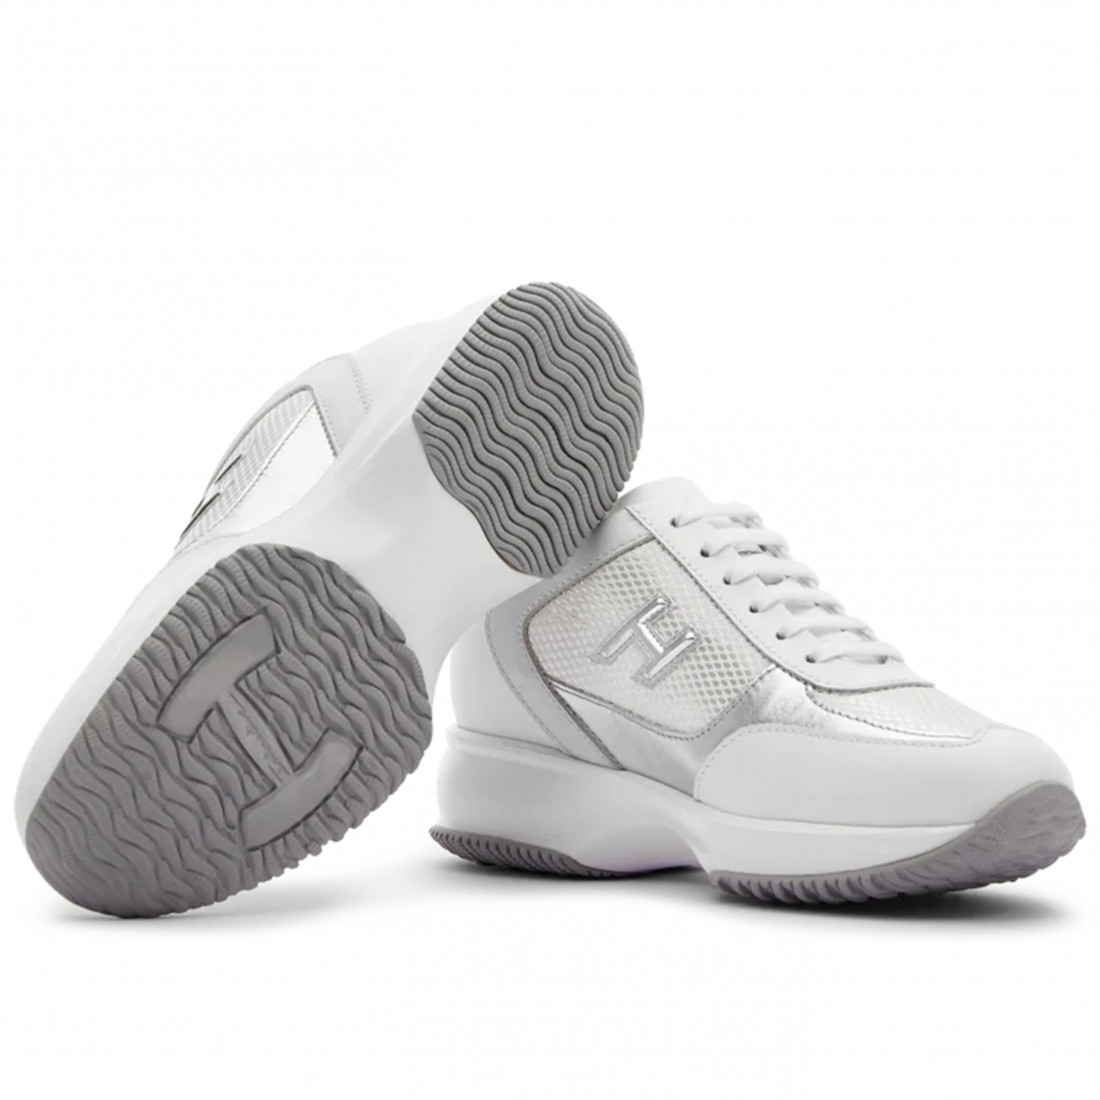 sneakers donna hogan hxw00n0bh50p950351 8121